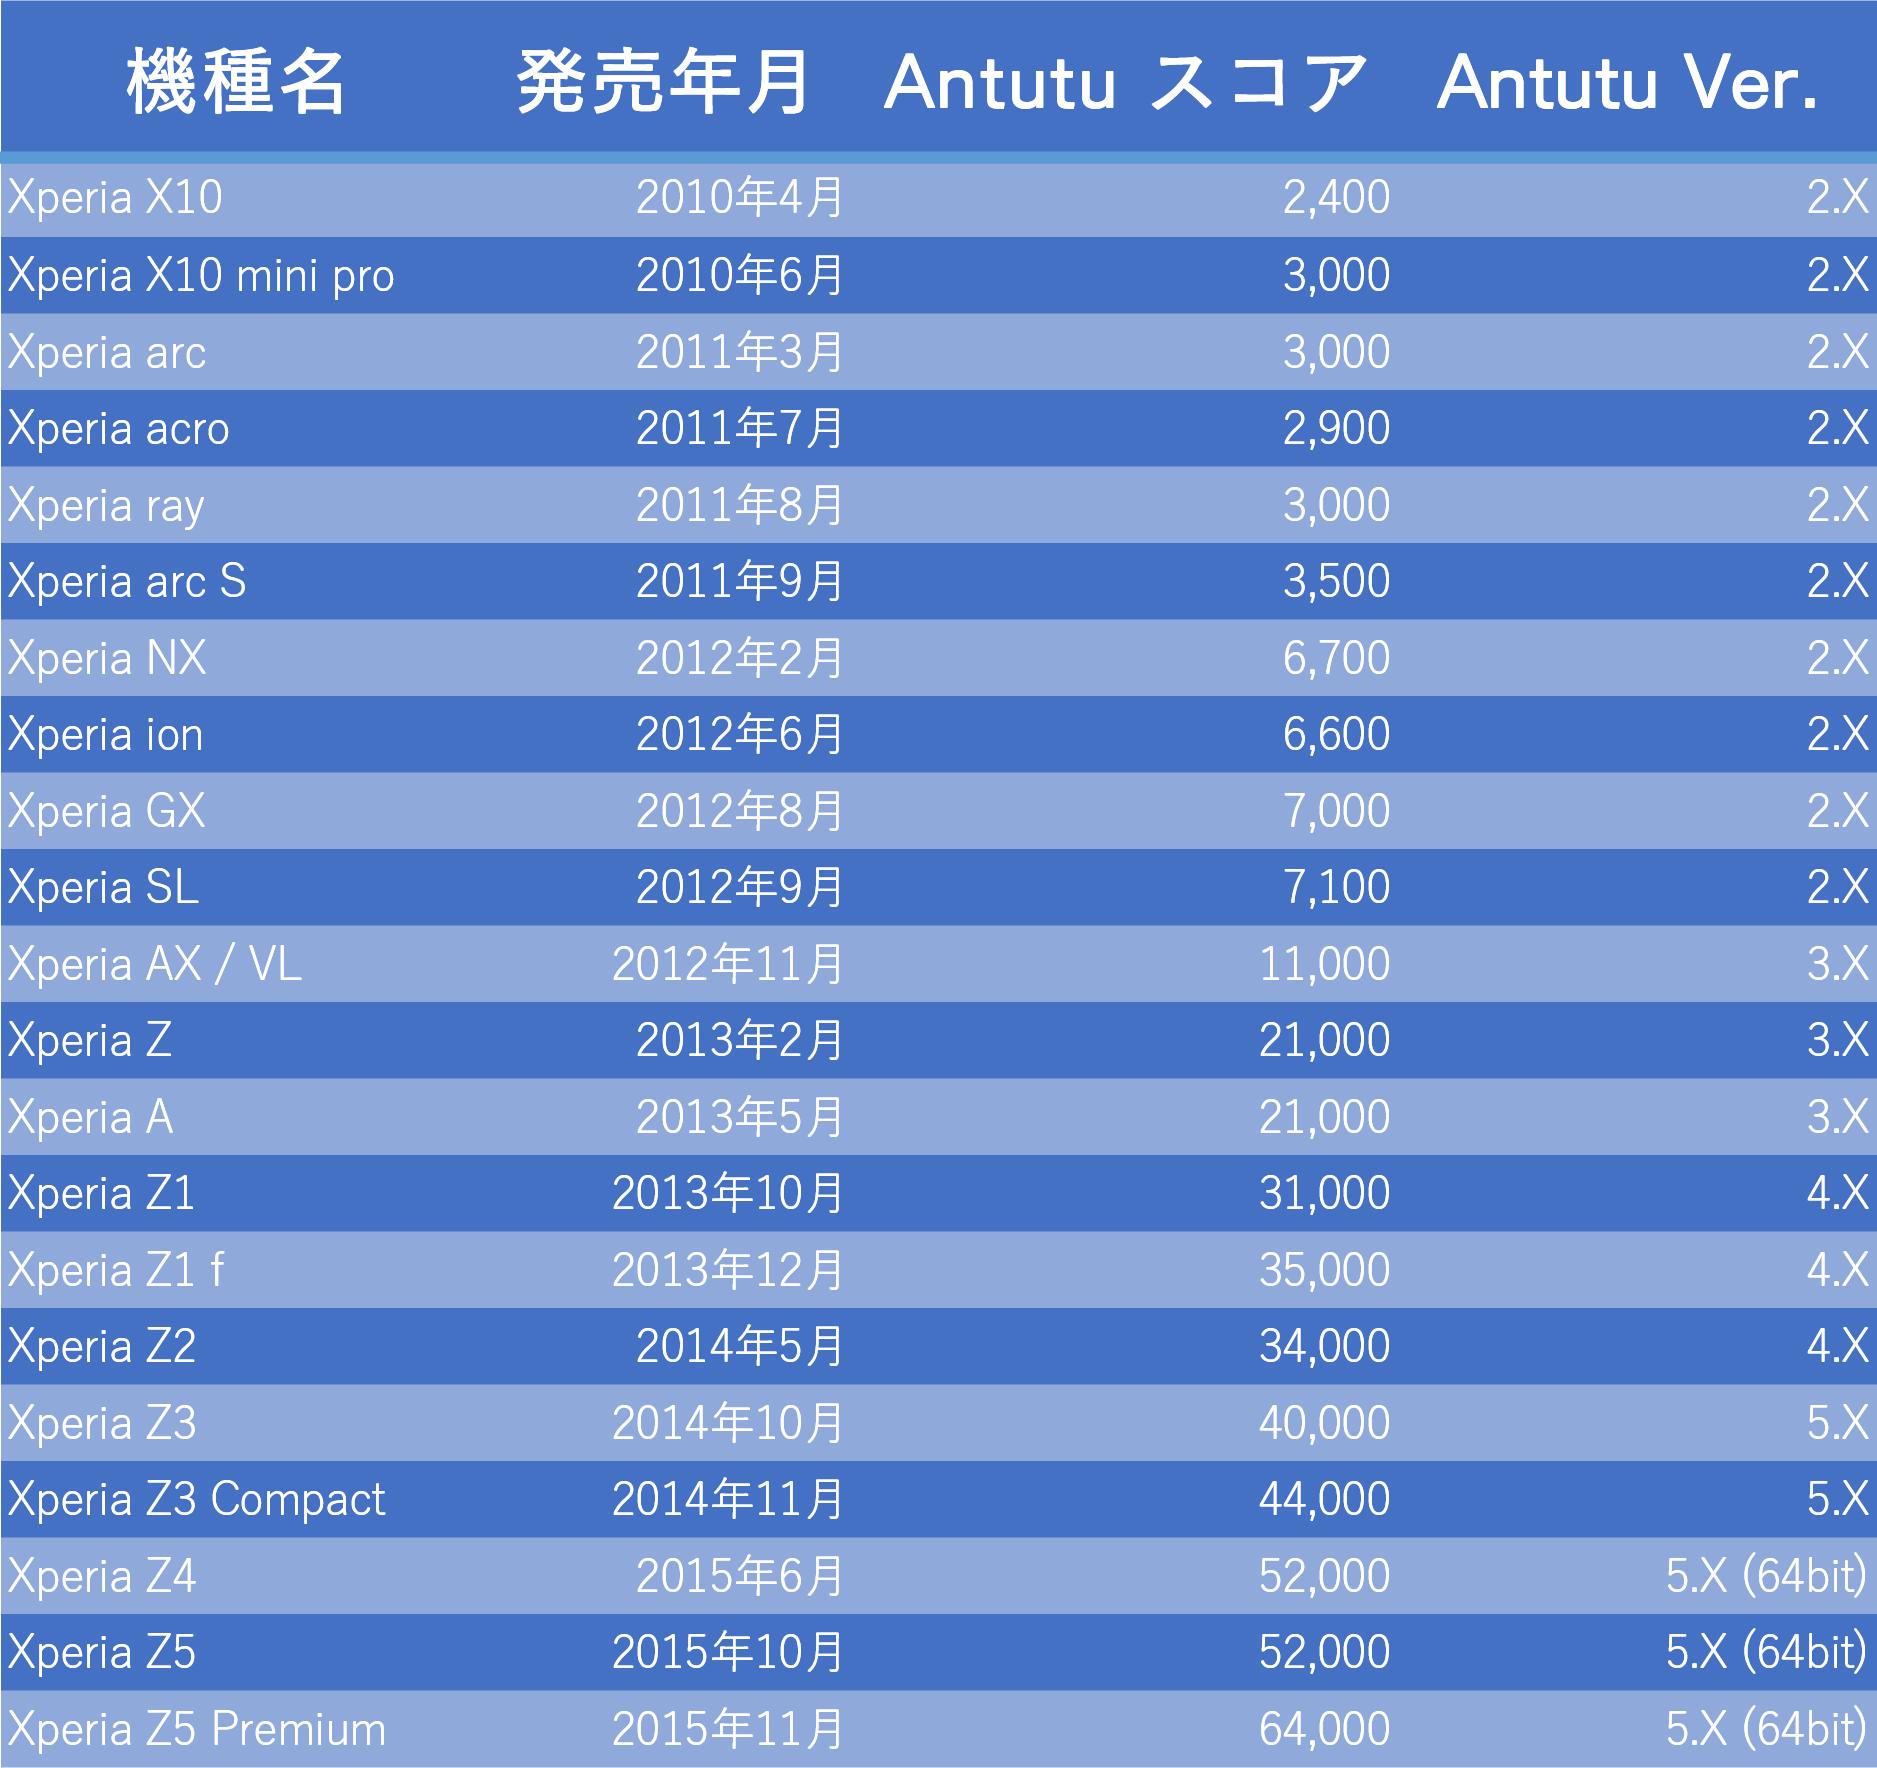 Xperiaの歴史 - Antutuベンチスコア表